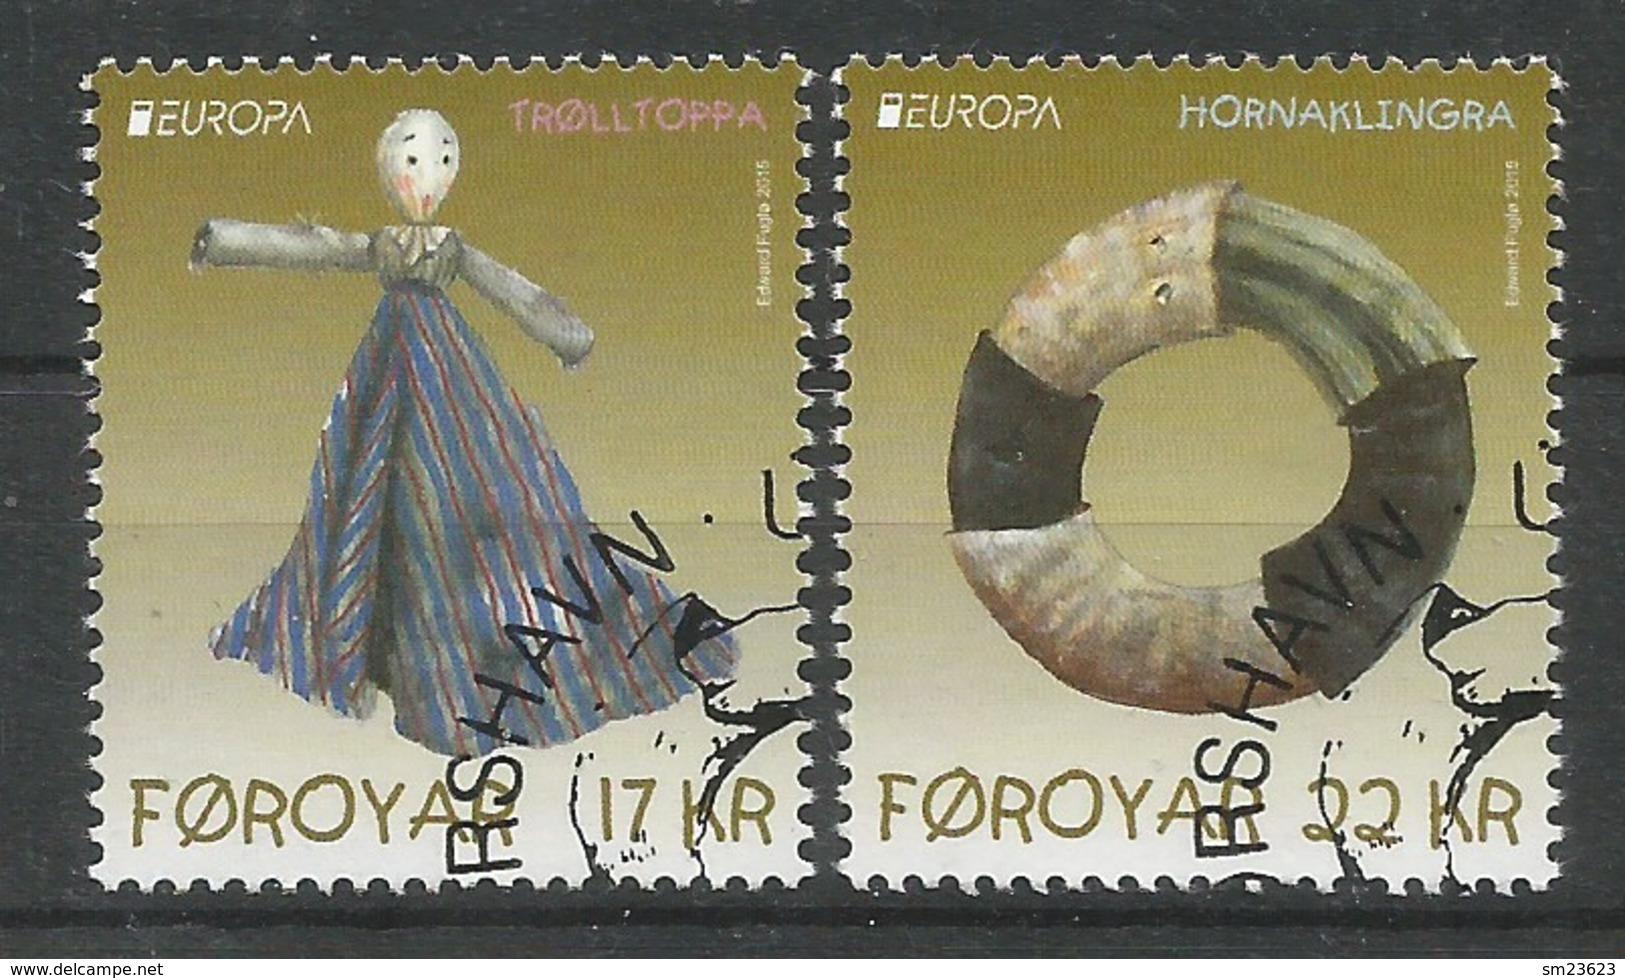 Dänemark-Färöer   2015   Mi.Nr. 836 / 837 , EUROPA CEPT - Historisches Spielzeug - Gestempelt / Used / (o) - Europa-CEPT